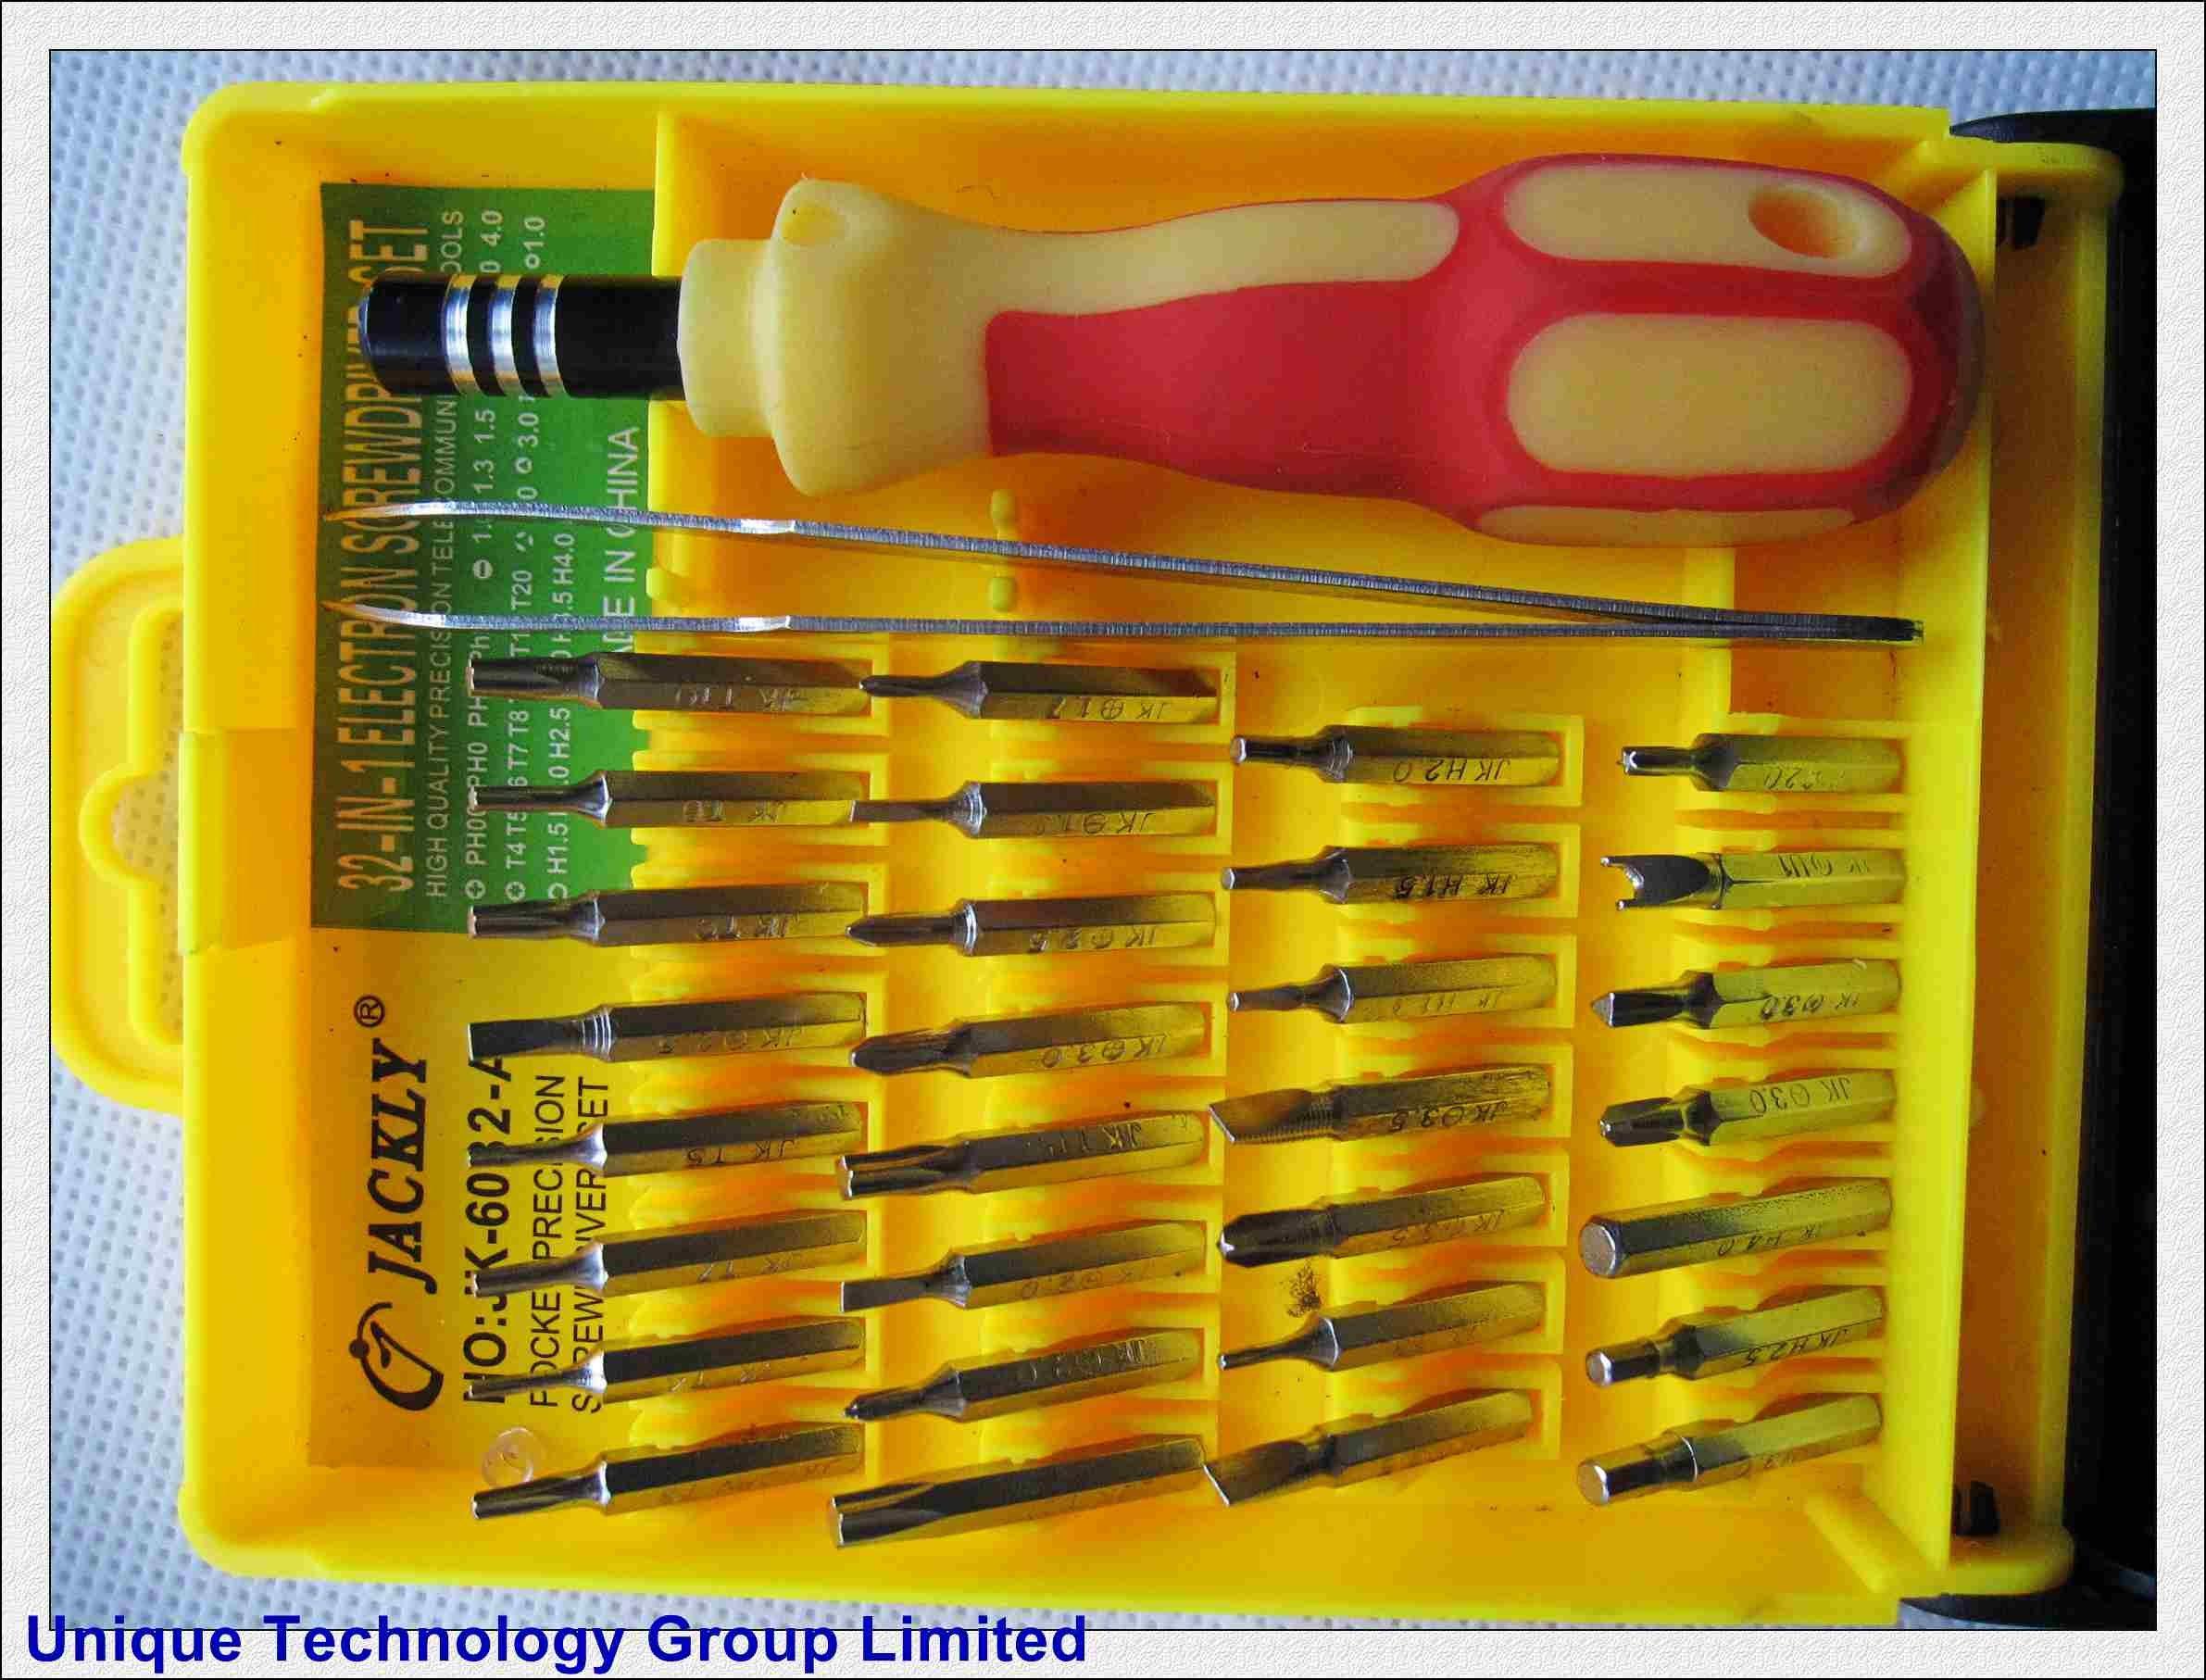 jackly 32 in 1 fix repair tool screwdriver ry225 jk 6032 a free shipping easy repair tool. Black Bedroom Furniture Sets. Home Design Ideas